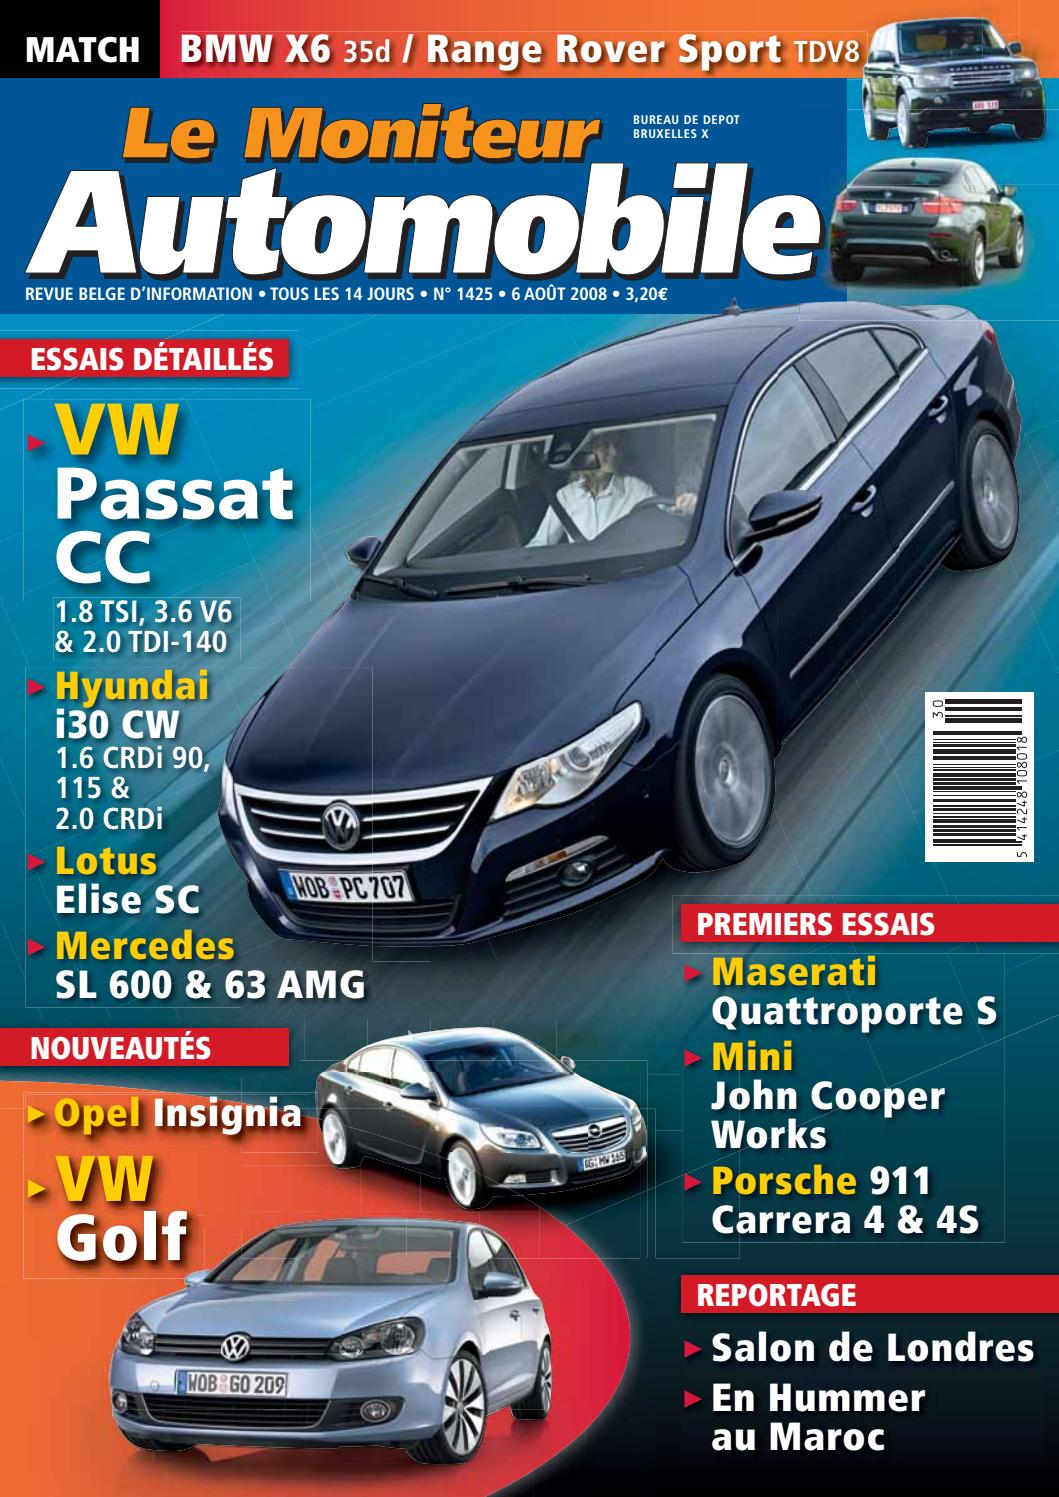 Moniteur Automobile 06082008 By Mustapha Mondeo Issuu